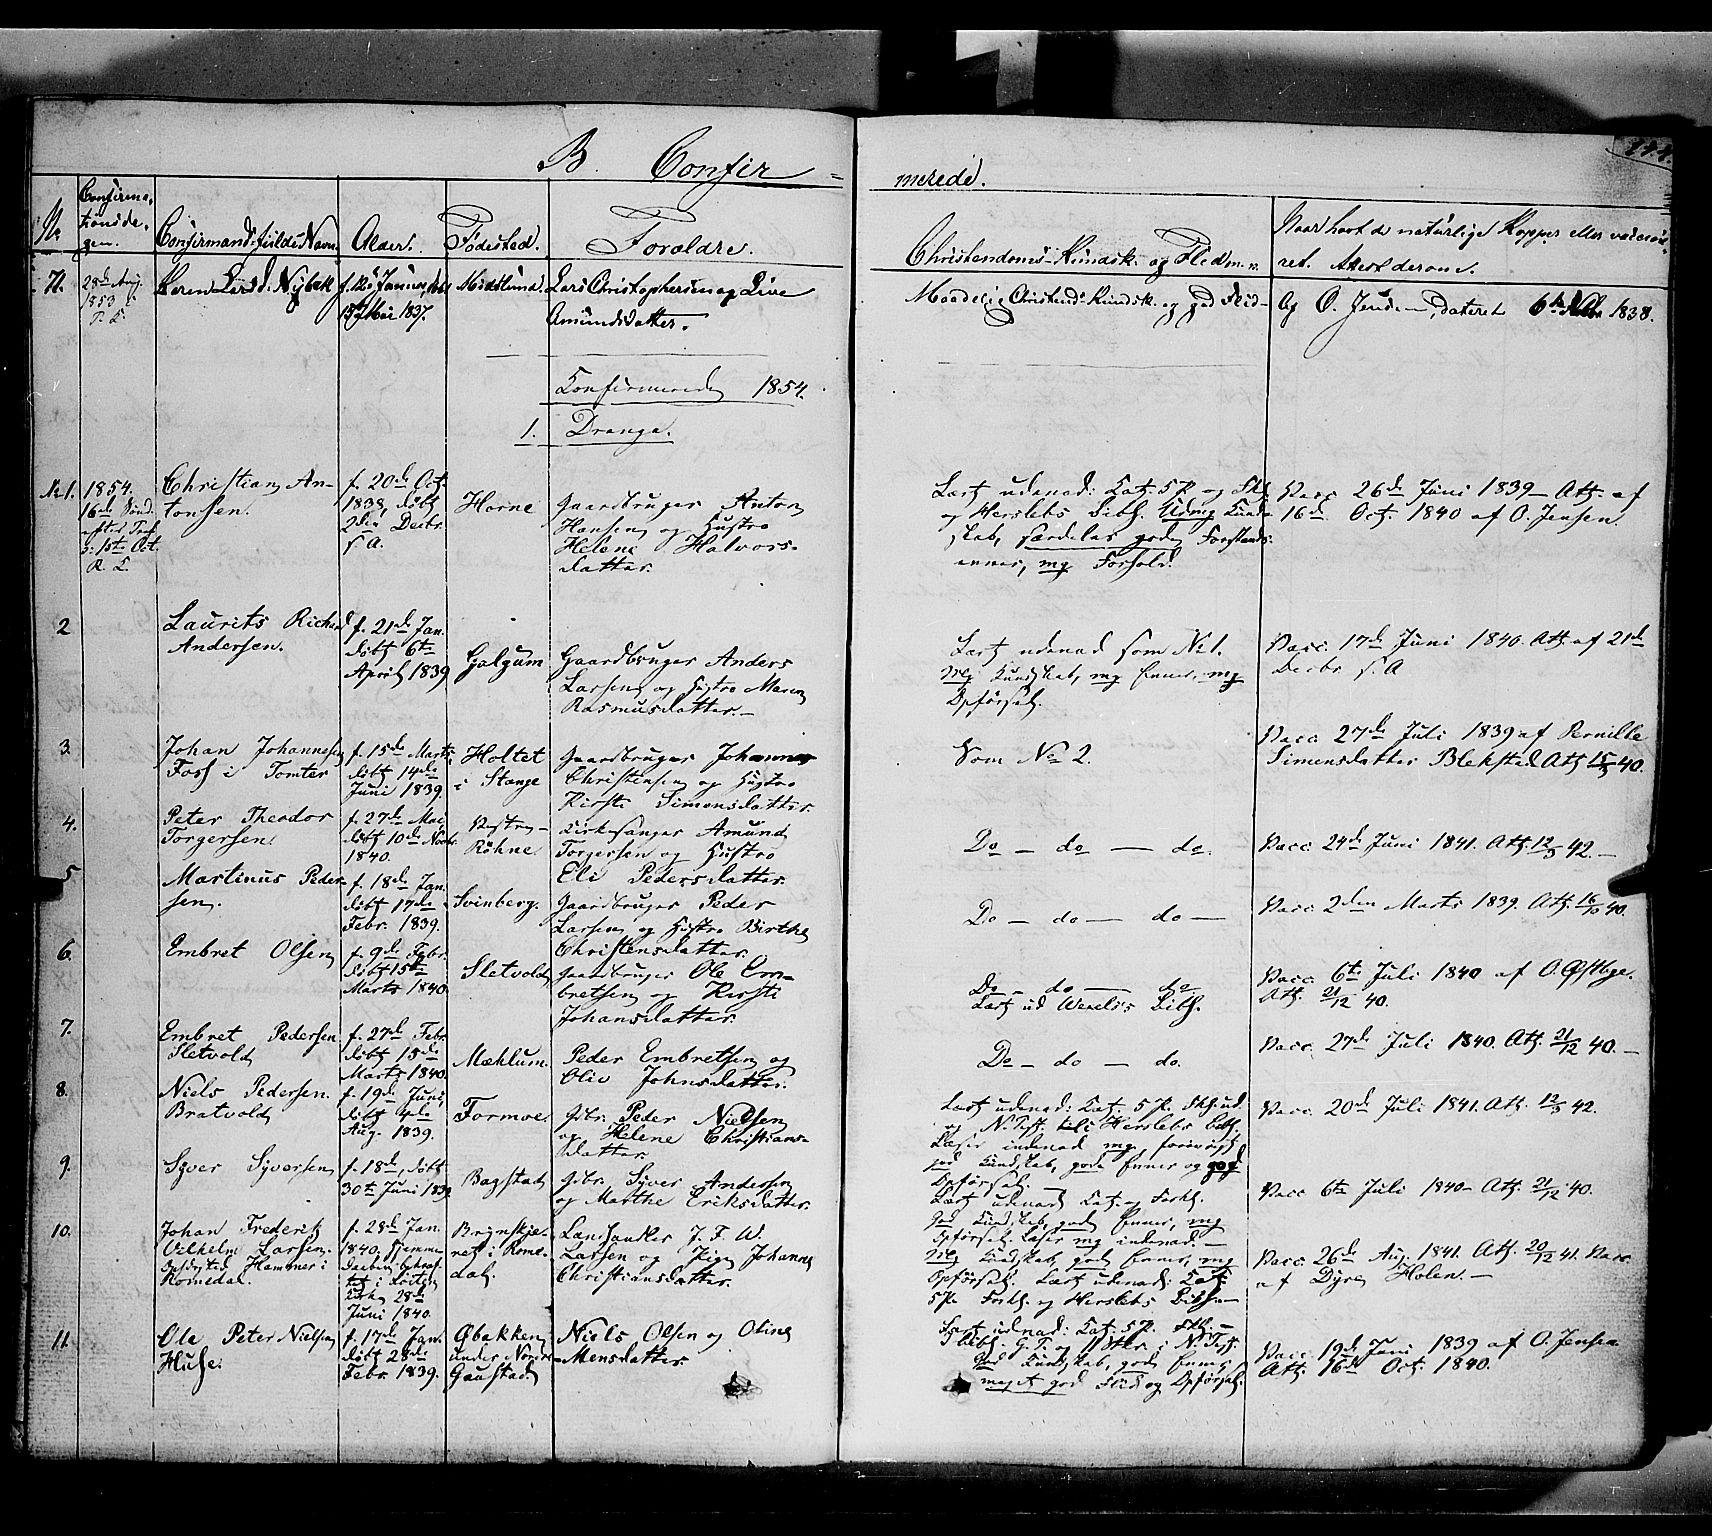 SAH, Romedal prestekontor, K/L0004: Ministerialbok nr. 4, 1847-1861, s. 144